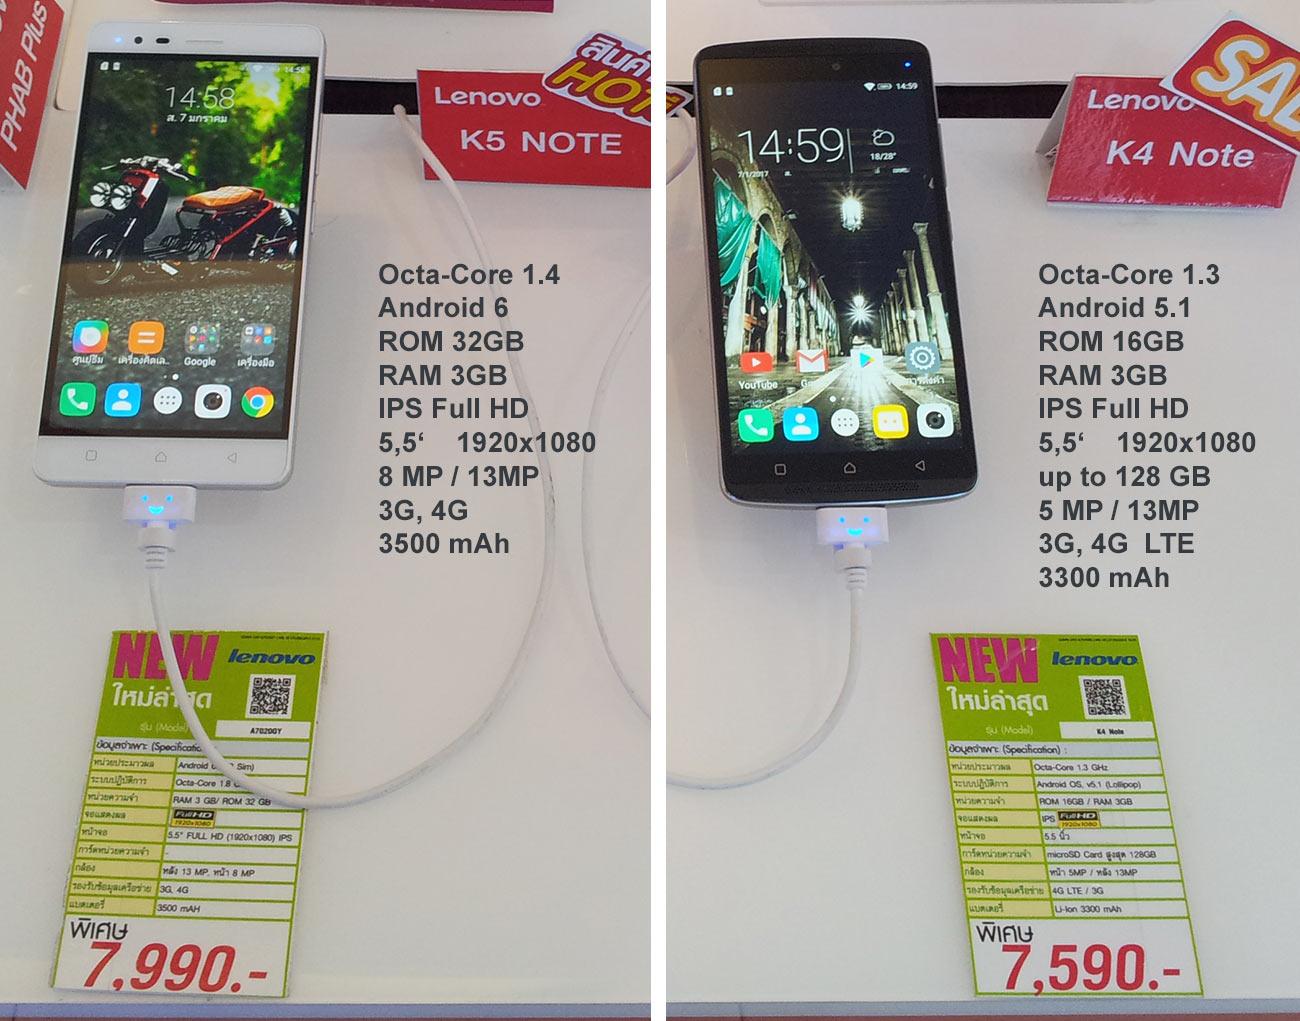 смартфоны Lenovo K4 и K5 Note